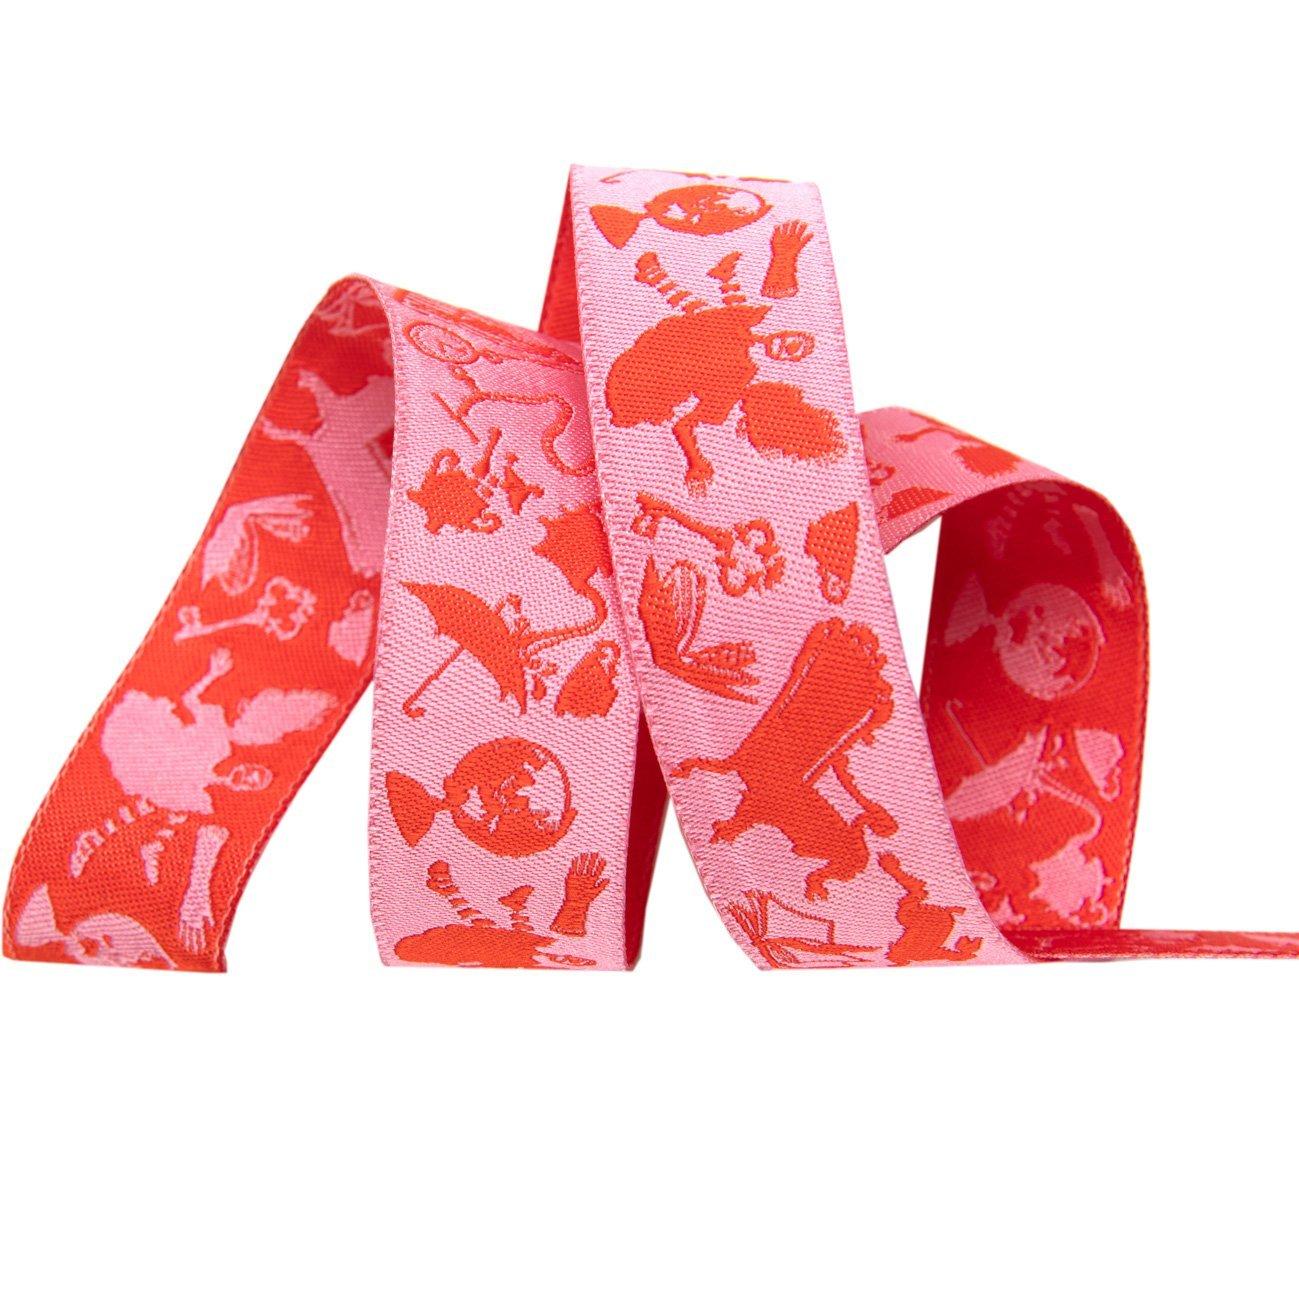 Renaissance Ribbons -Tula Pink Curiouser - Down the Rabbit Hole Pink-7/8